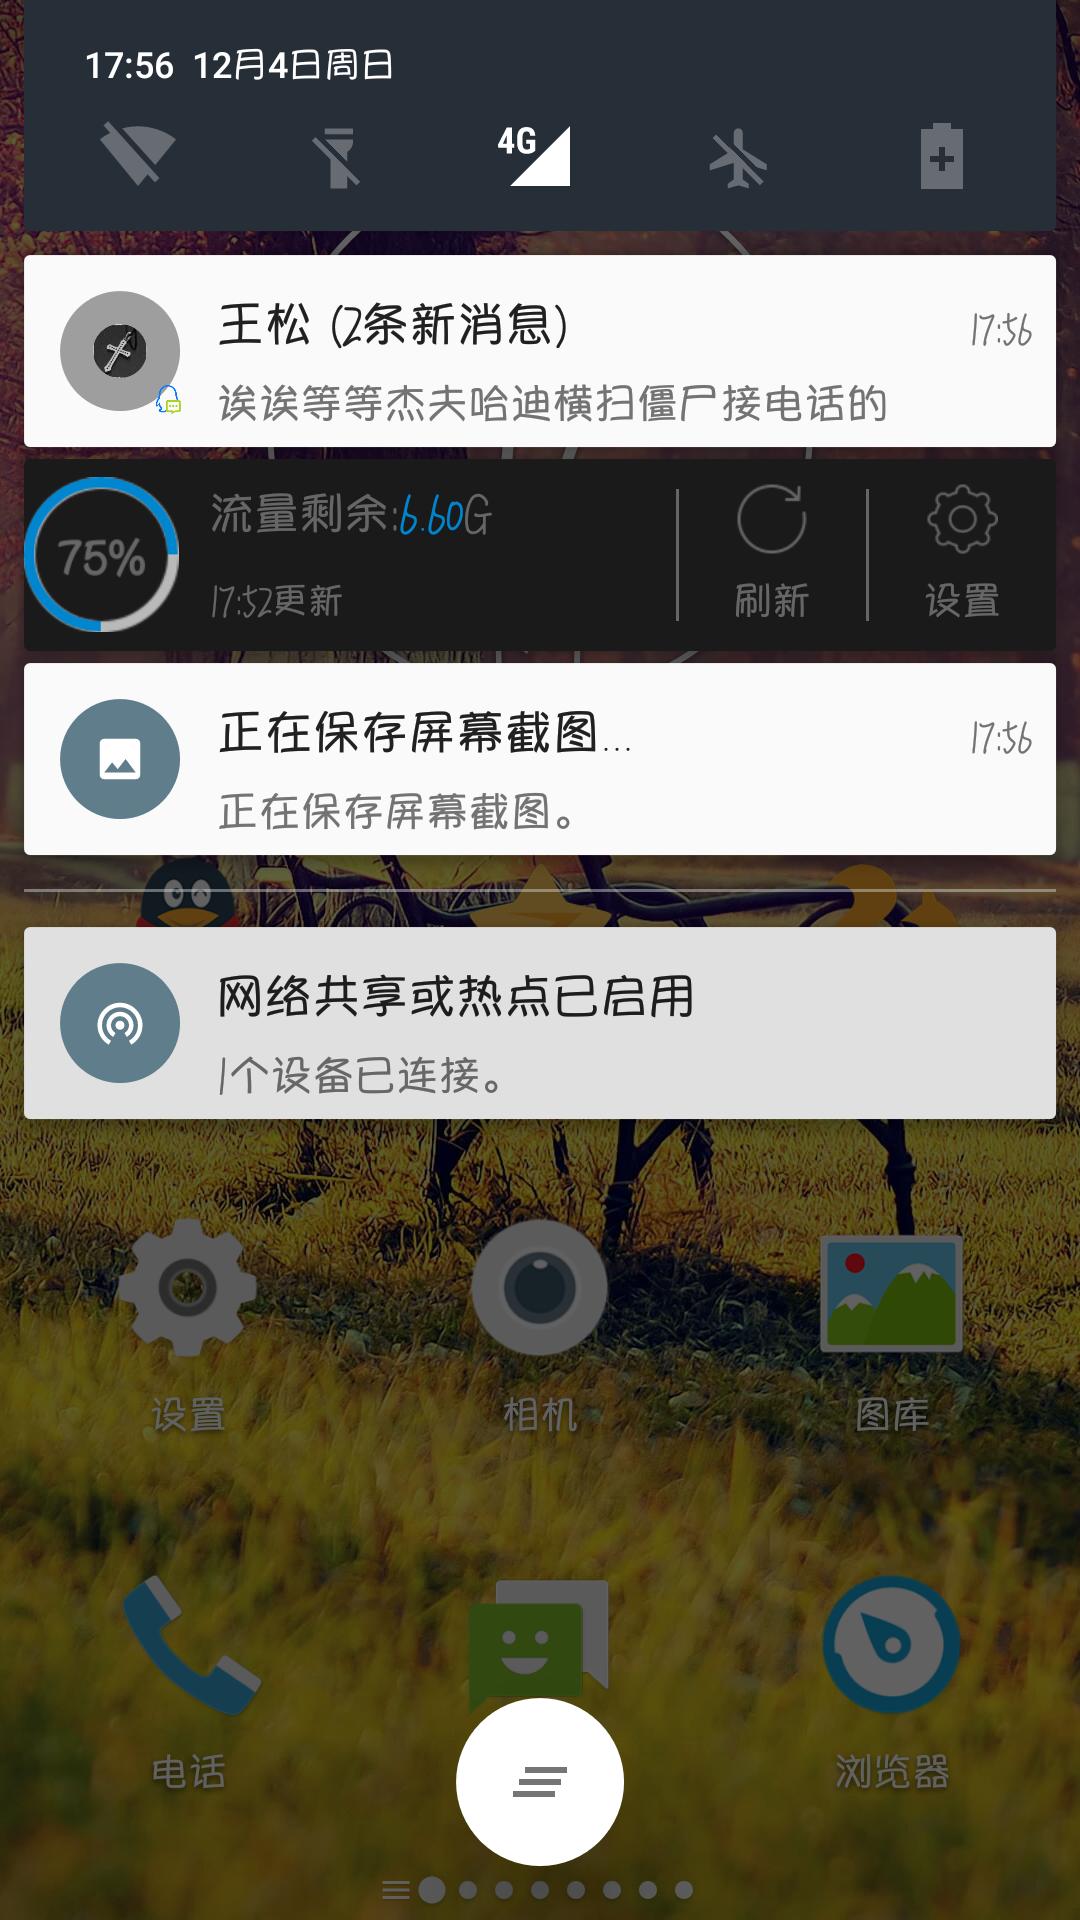 Screenshot_20161204-175605.png